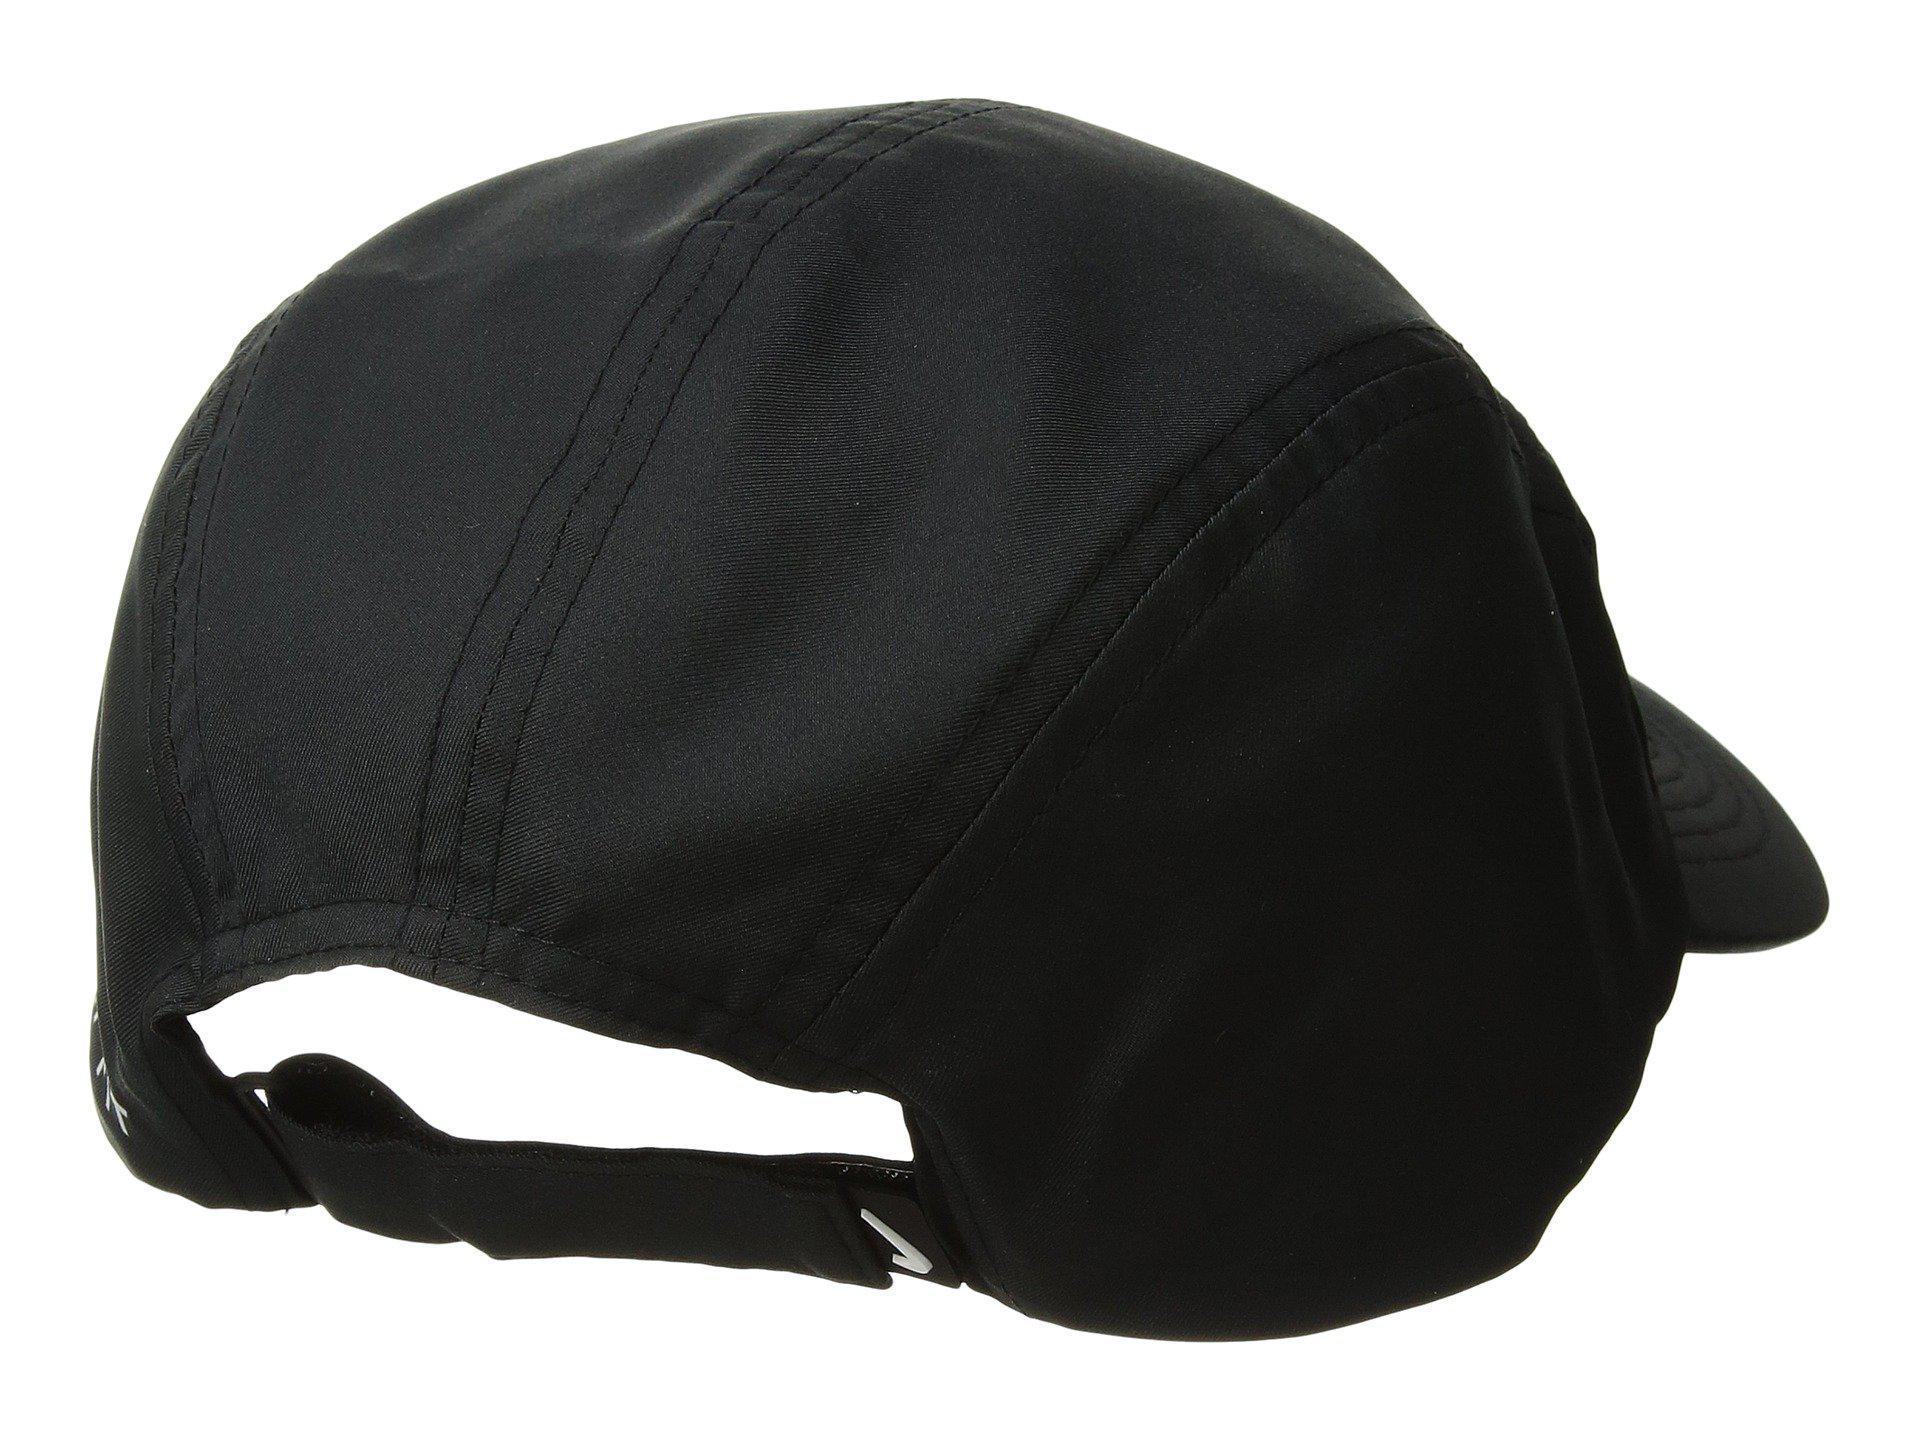 Lyst - Nike Aw84 Core Cap in Black for Men 111953daa9e